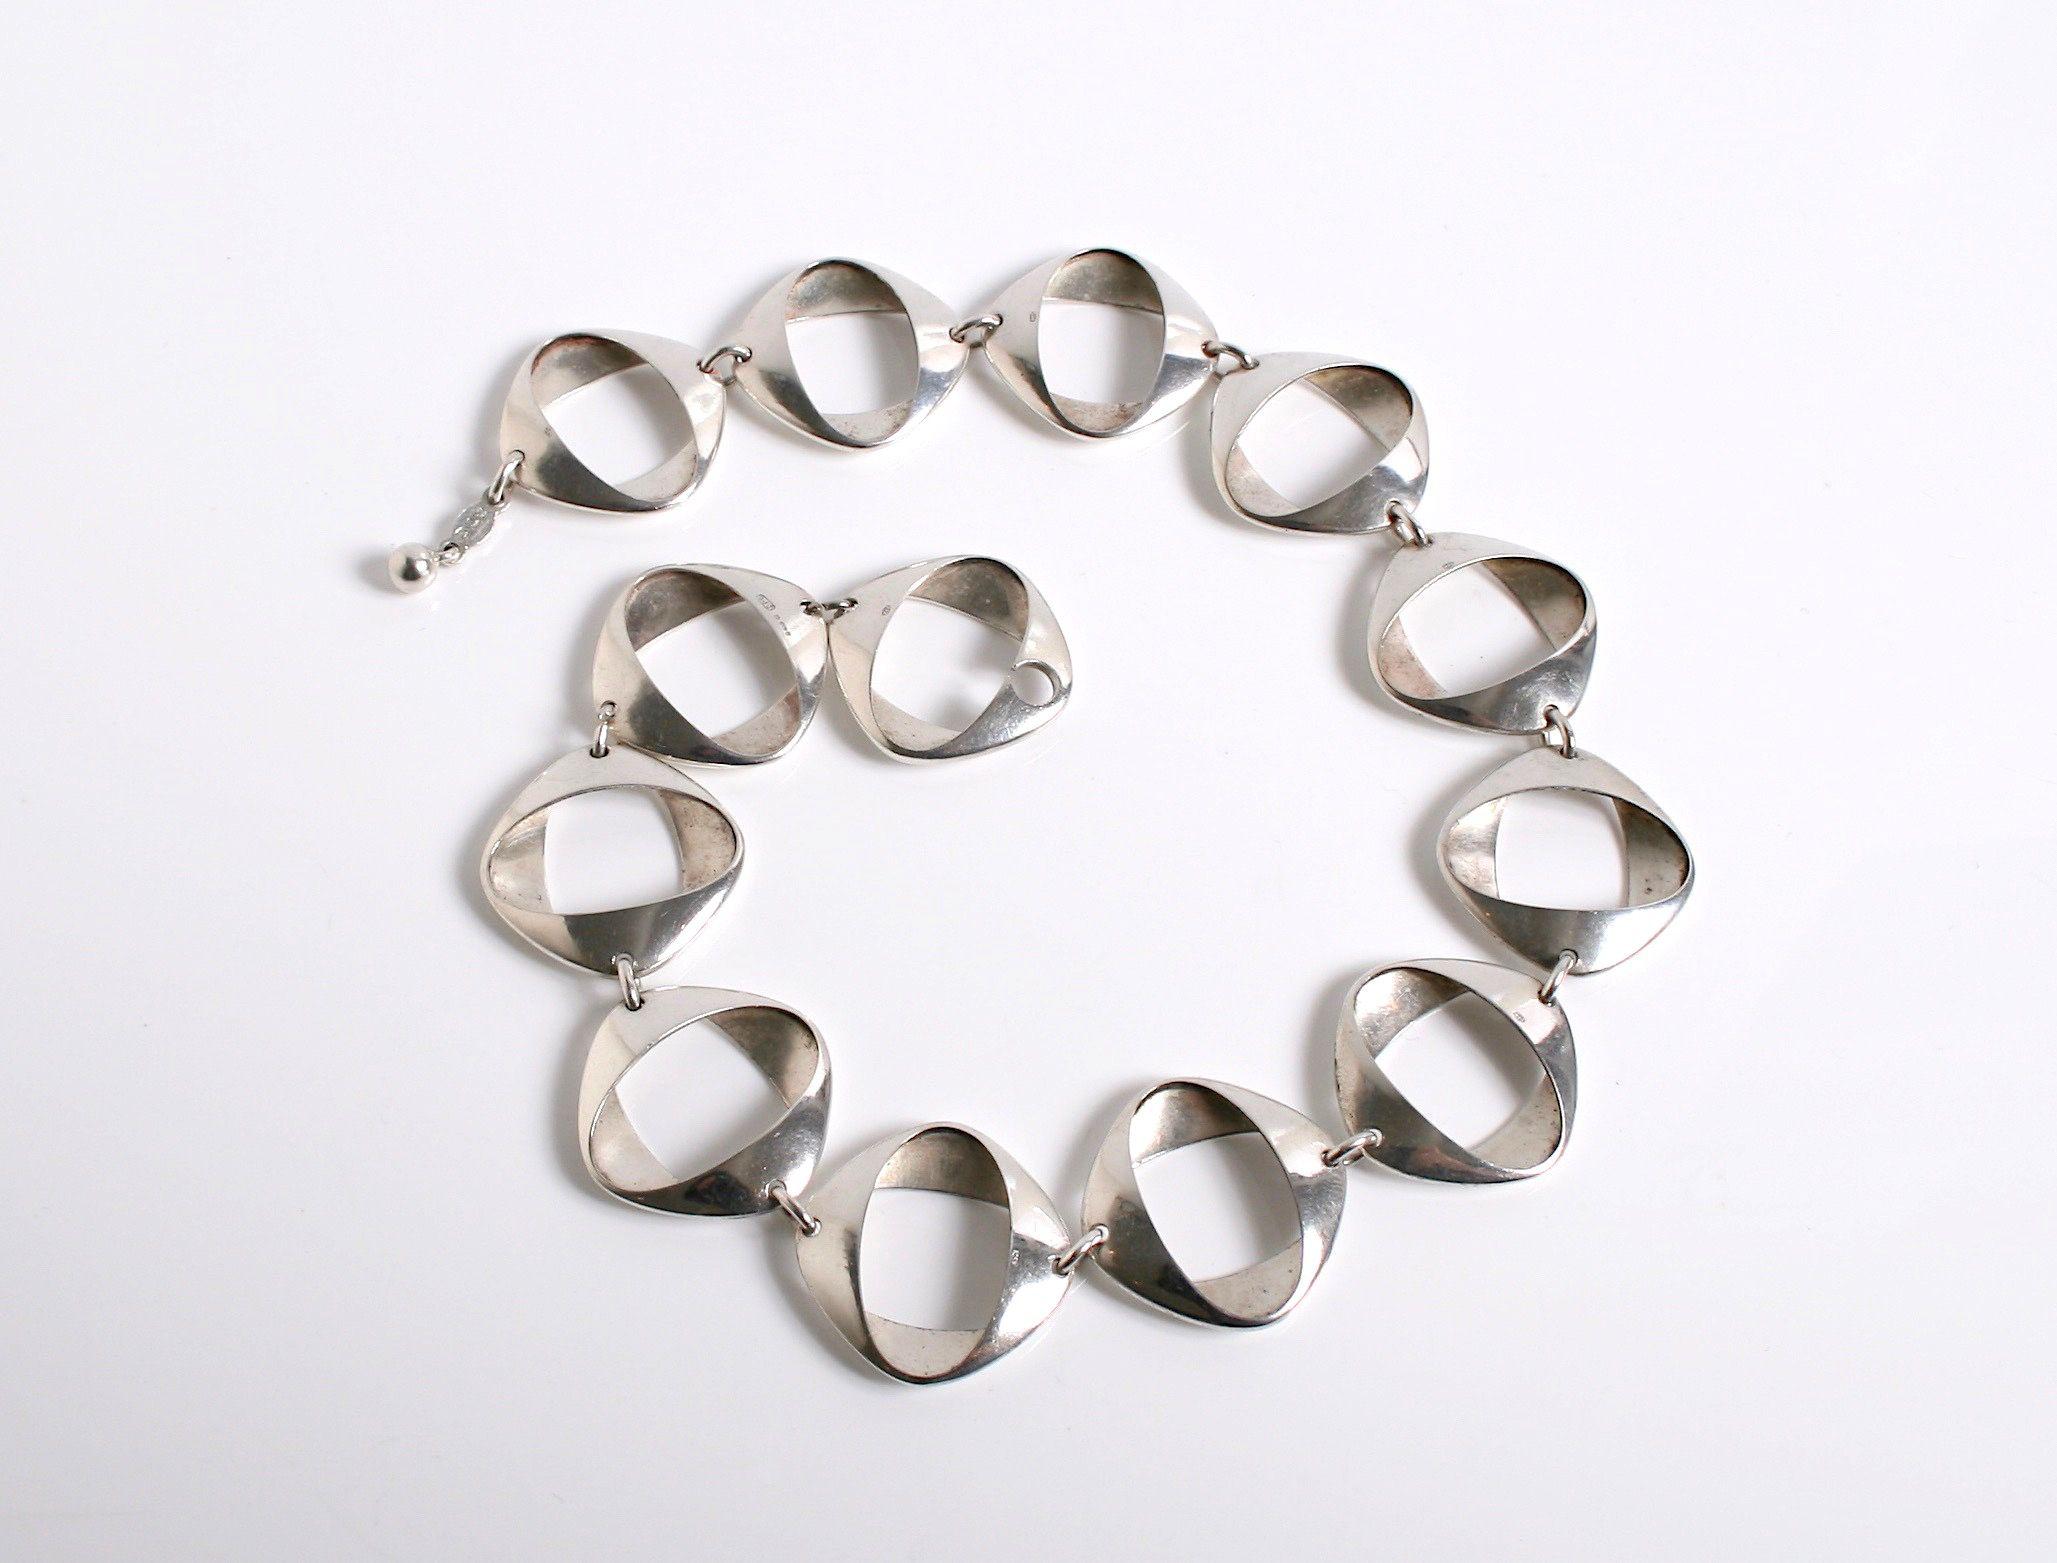 Rare Henning Koppel Necklace For Georg Jensen Denmark C 1960 Jewelry Art Jewelry Necklace Designs